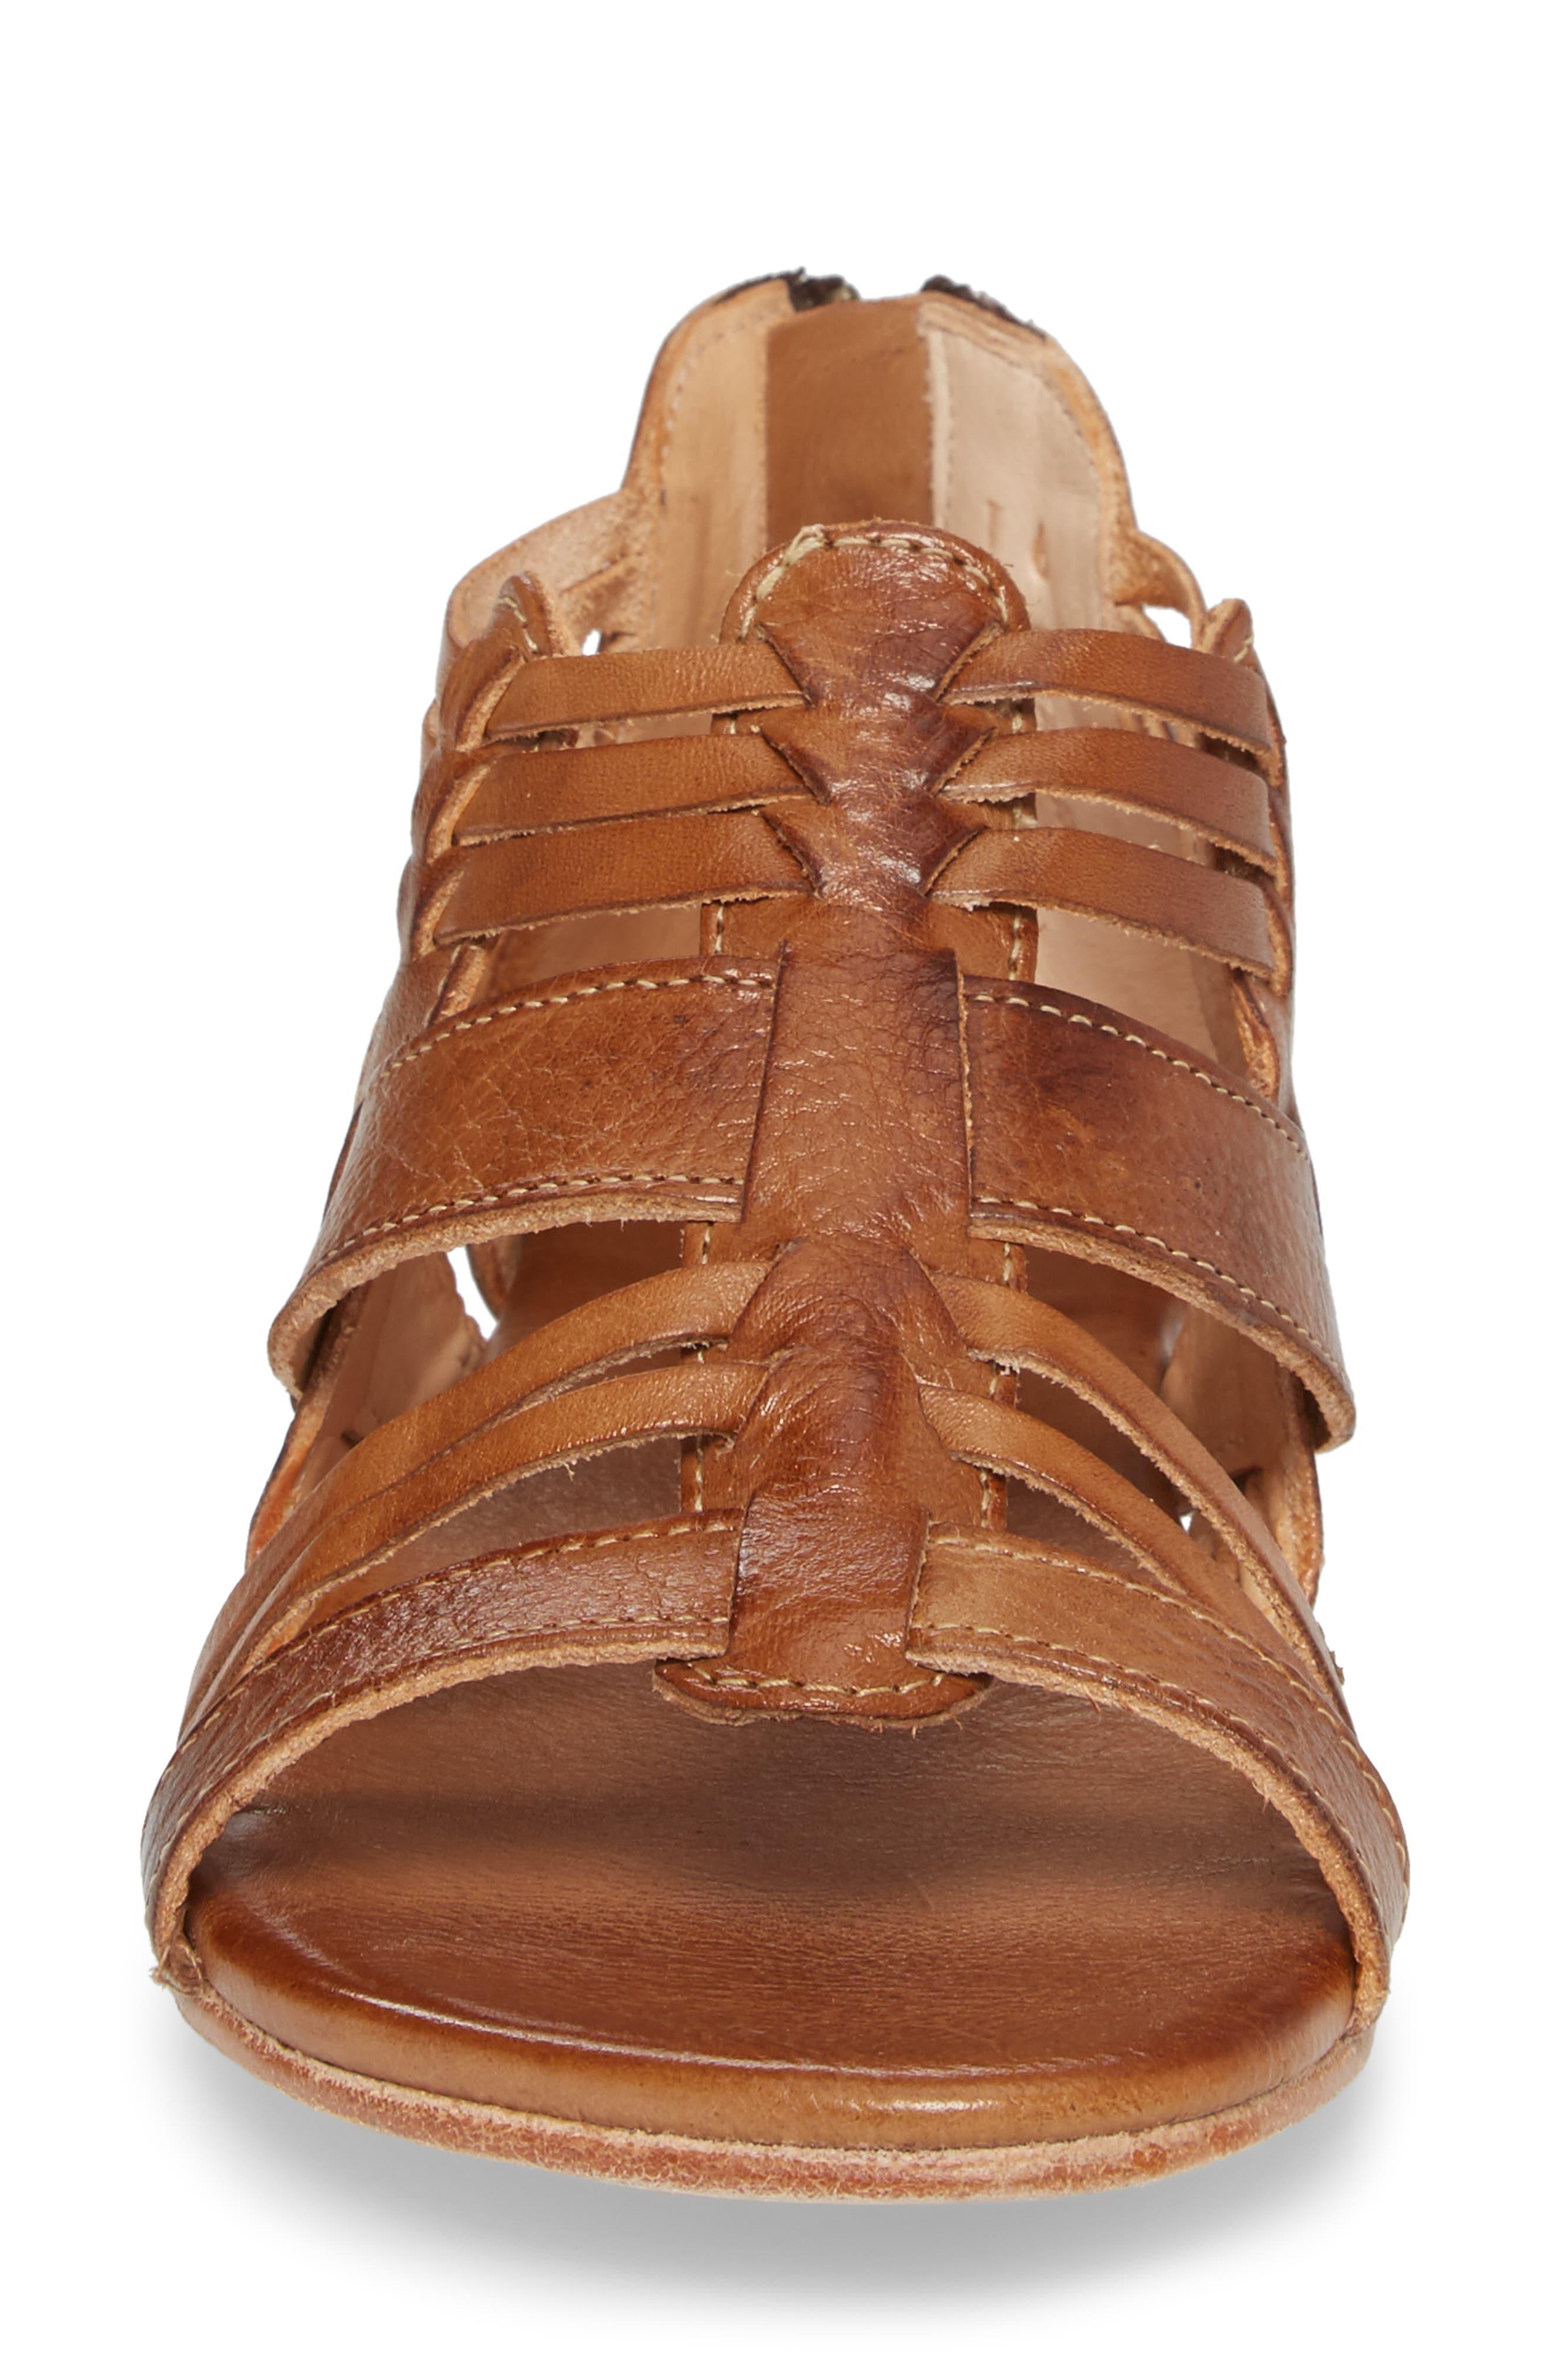 Cara Sandal,                             Alternate thumbnail 4, color,                             Tan Leather